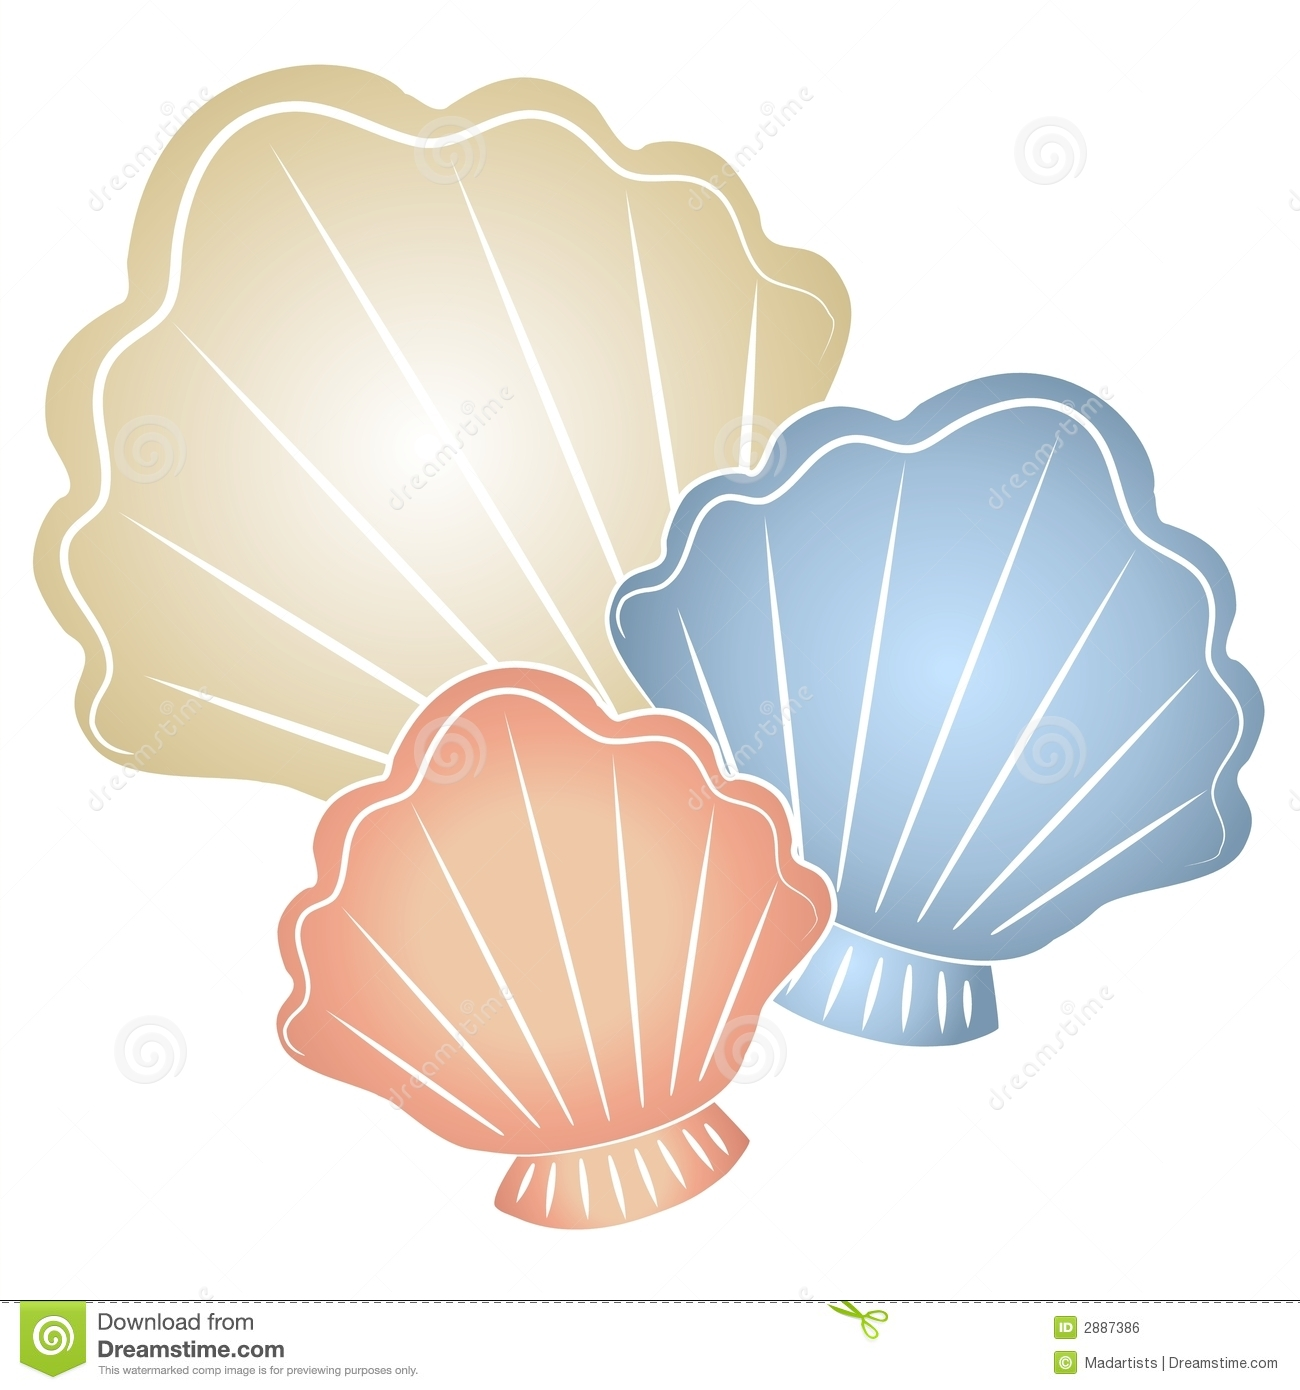 Clip Art Seashell Clip Art Seashells Cli-Clip Art Seashell Clip Art seashells clip art clipartall pastel art-1